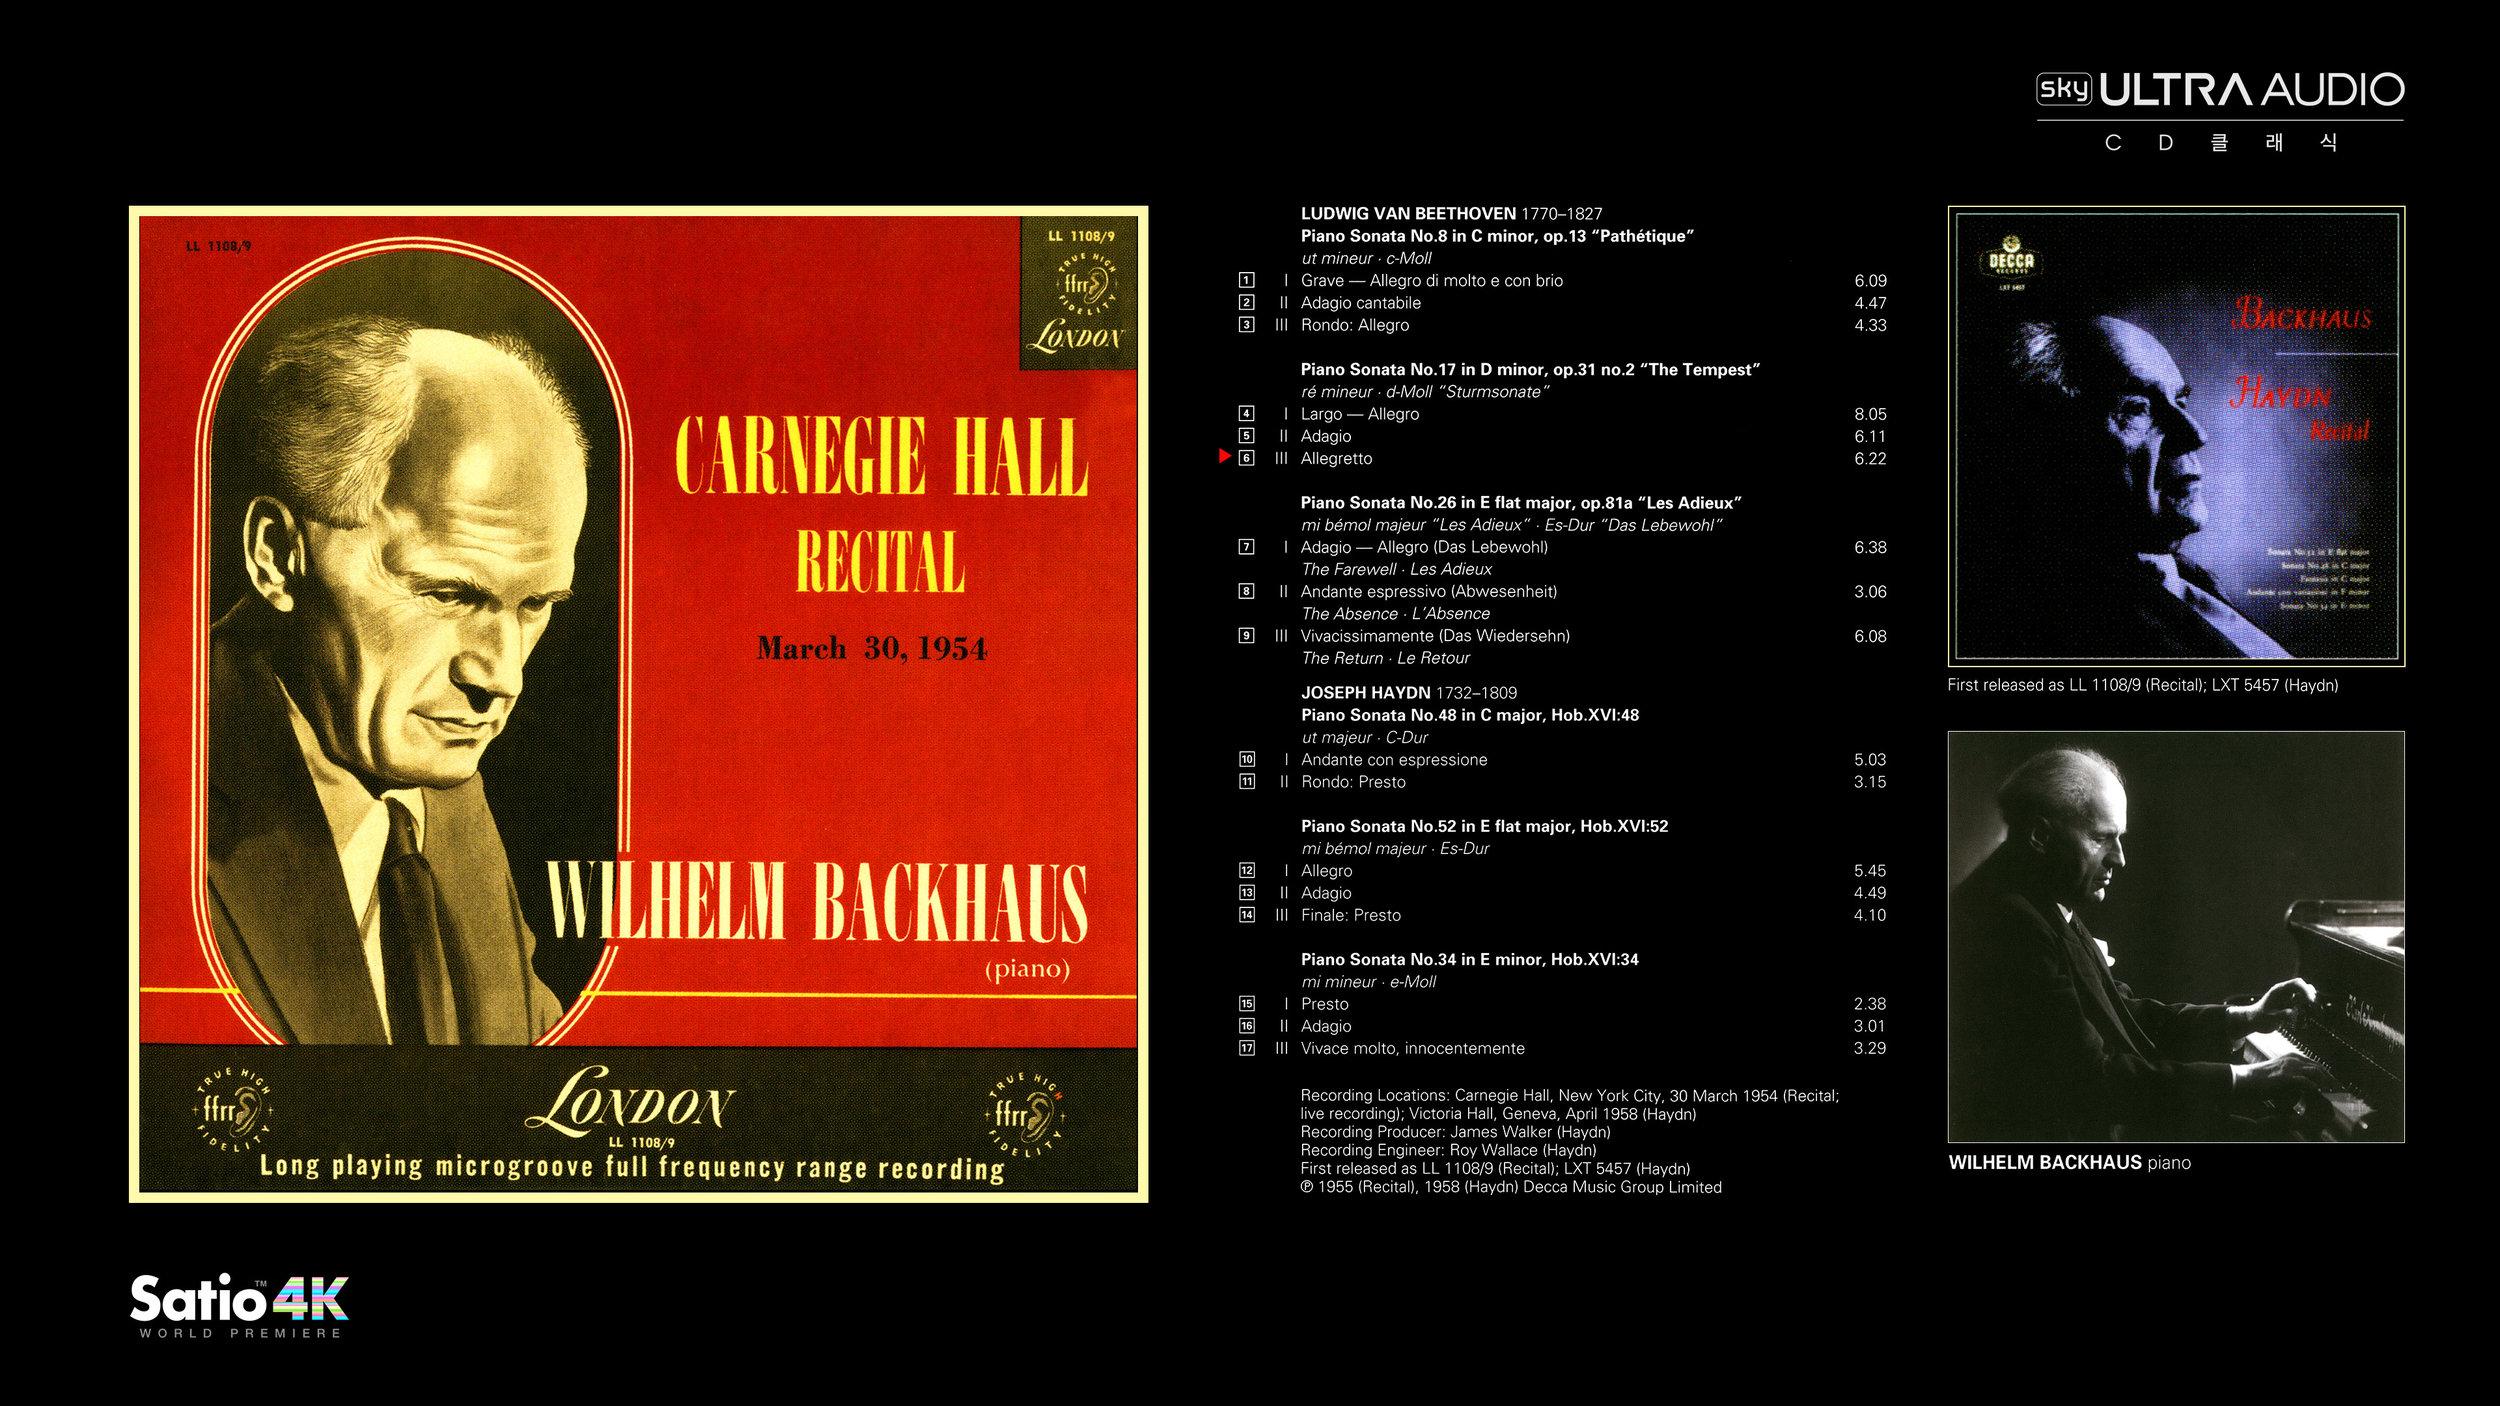 Wilhelm Backhaus_Carnegie Hall Recital 1954.jpg